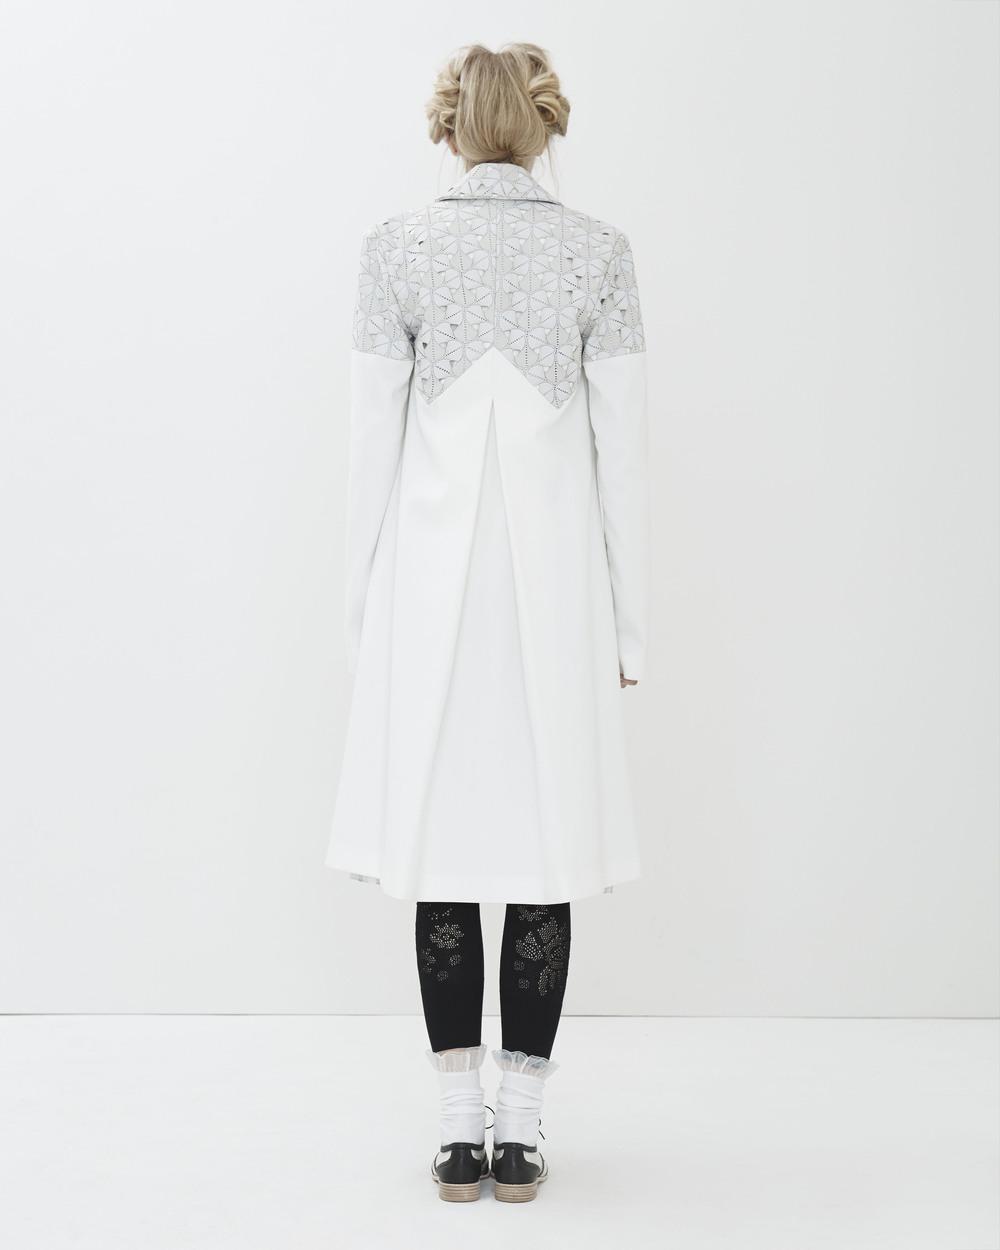 Ali Rose 2015 Look 3: 'Katherine' Lab Coat, 'Tourniquet' Shirt Dress, 'Eileen' Lace Legging